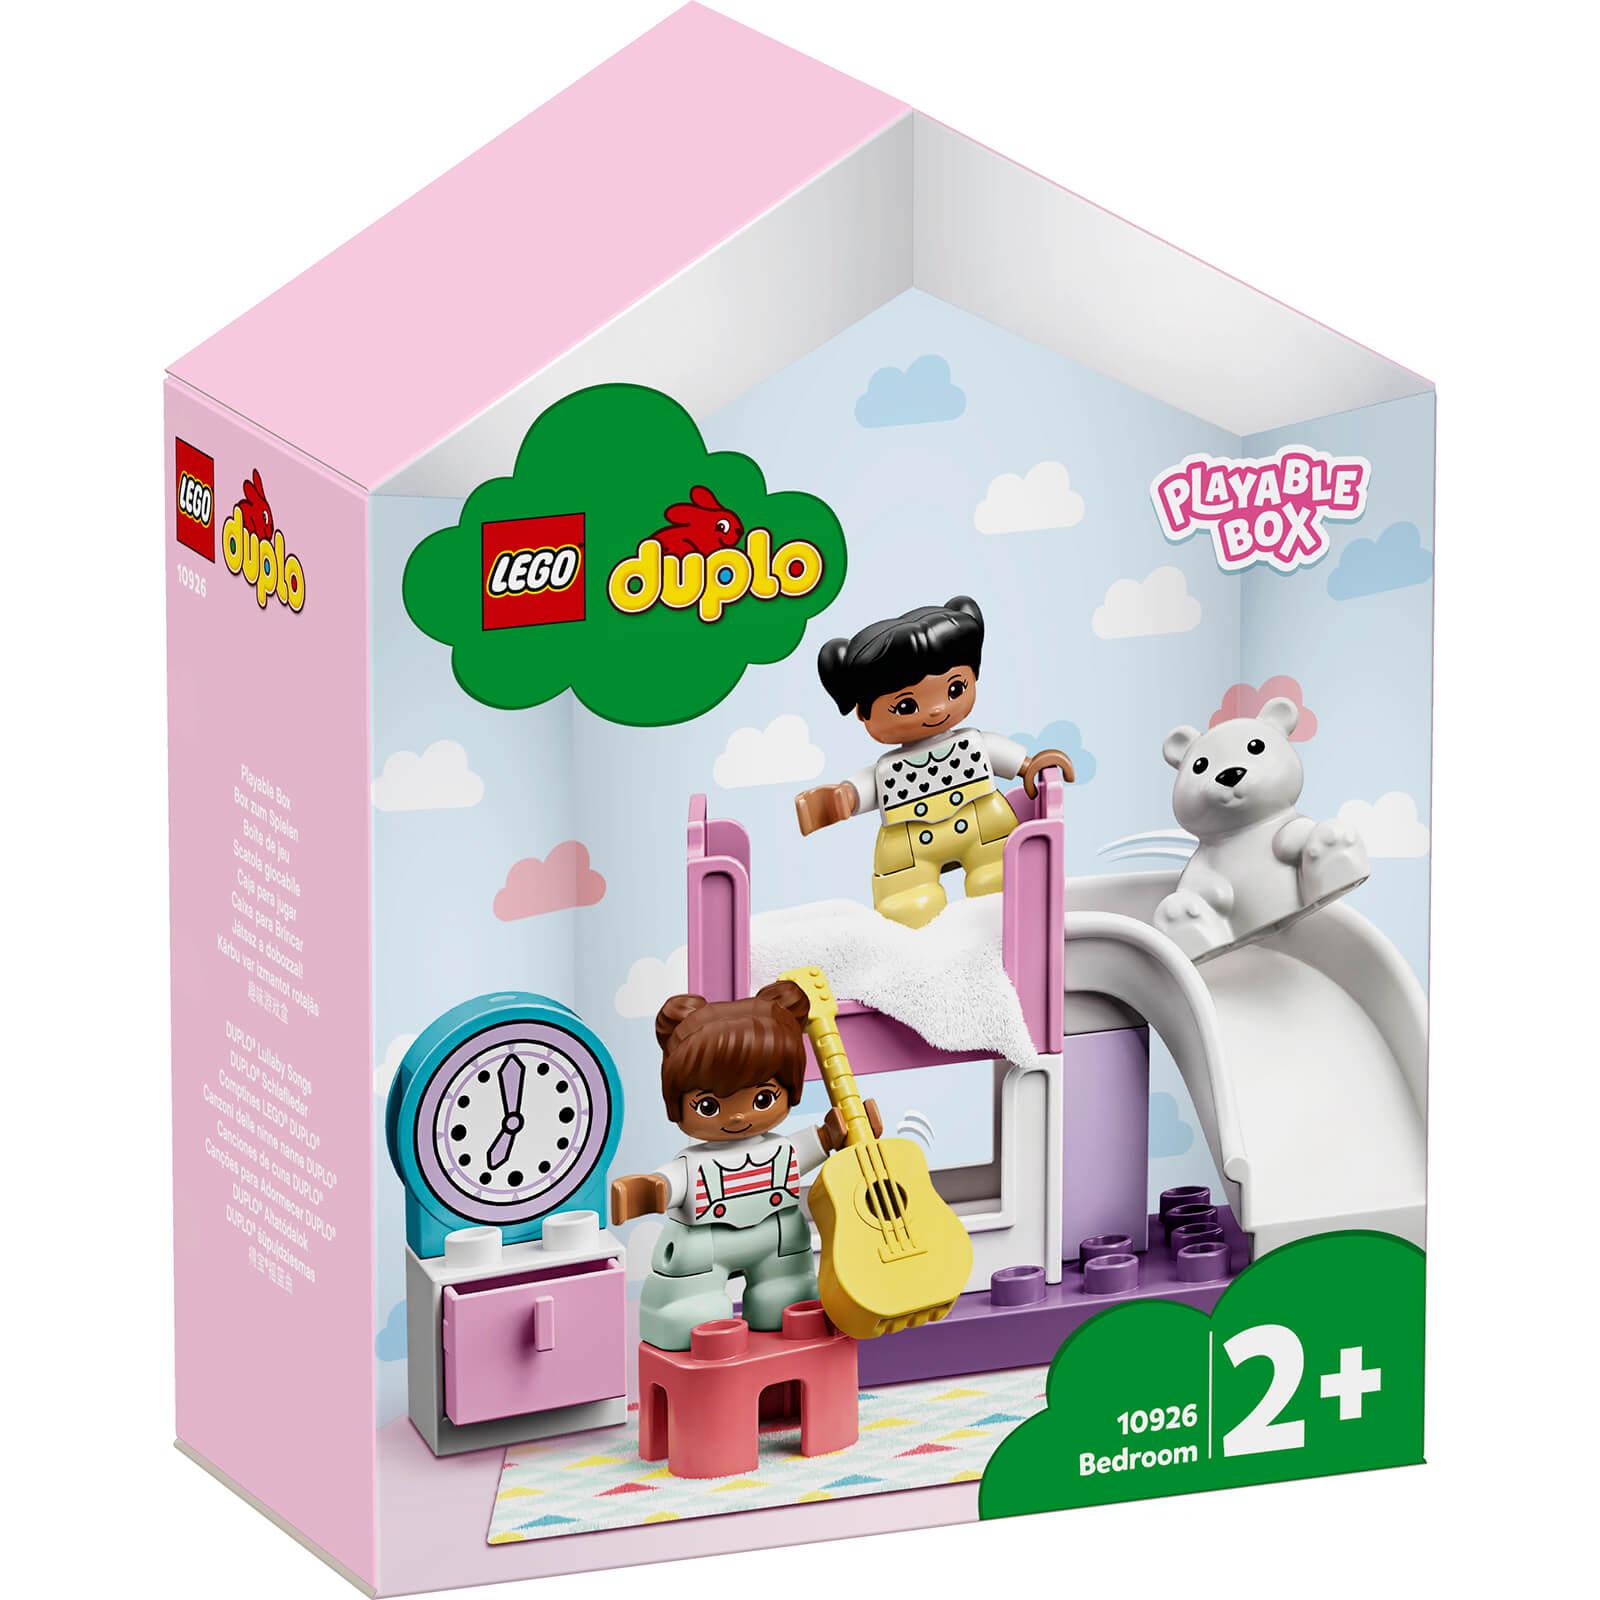 Image of LEGO Duplo Bedroom - 10926